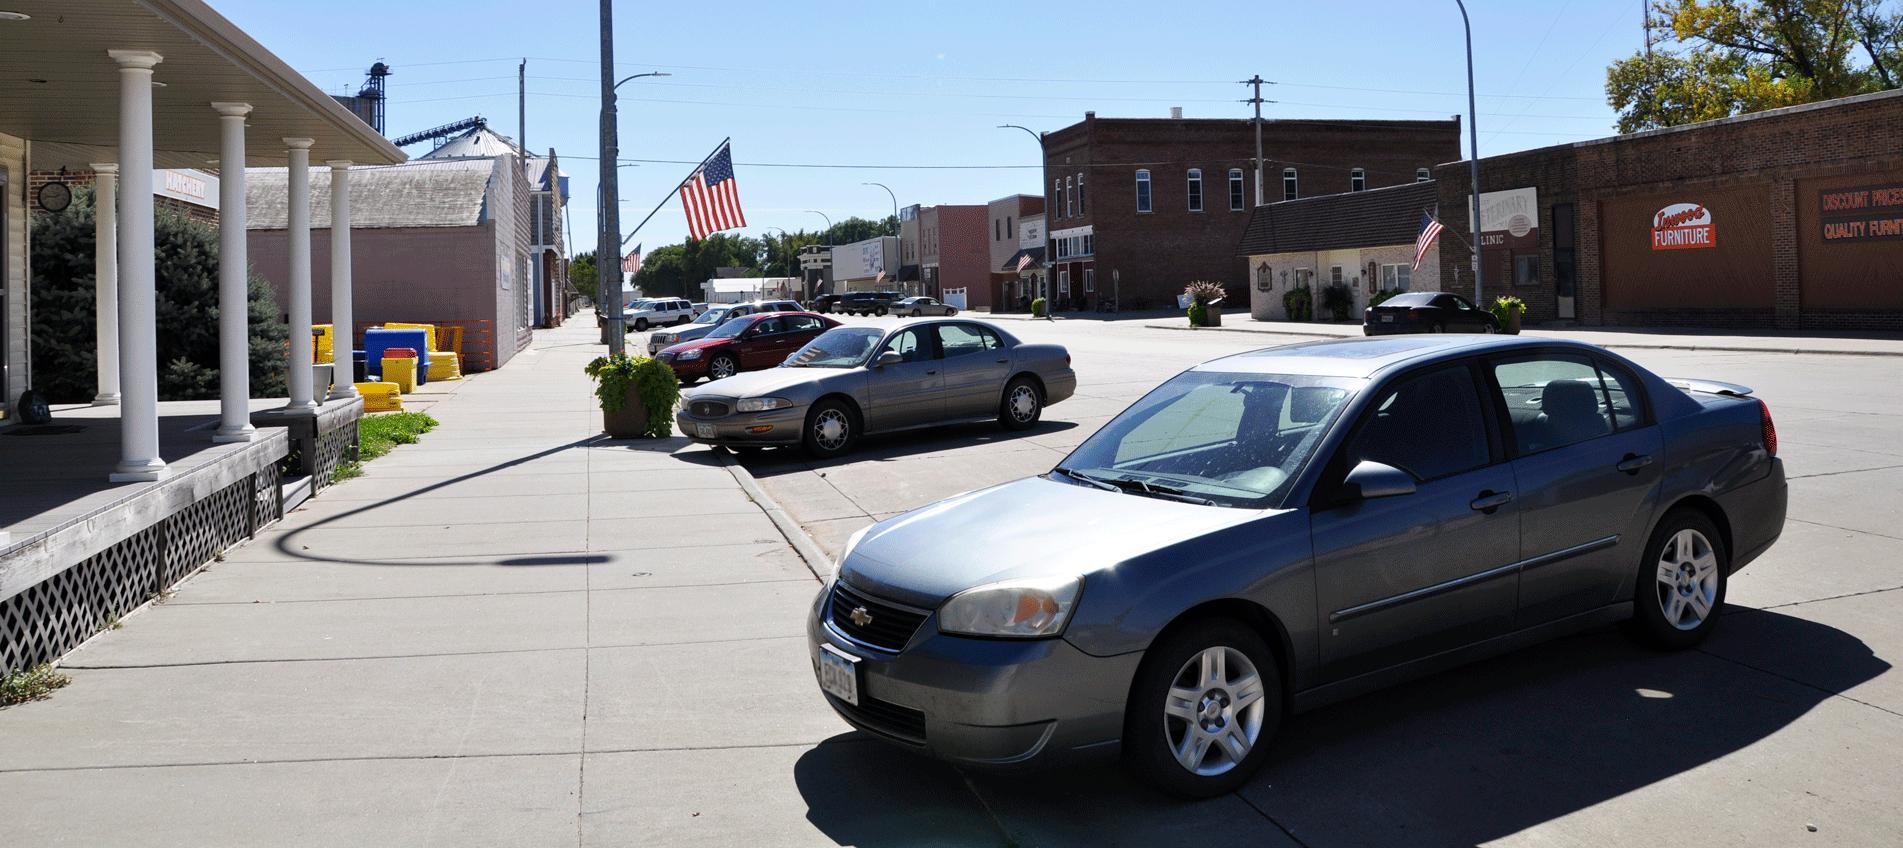 inwood main street